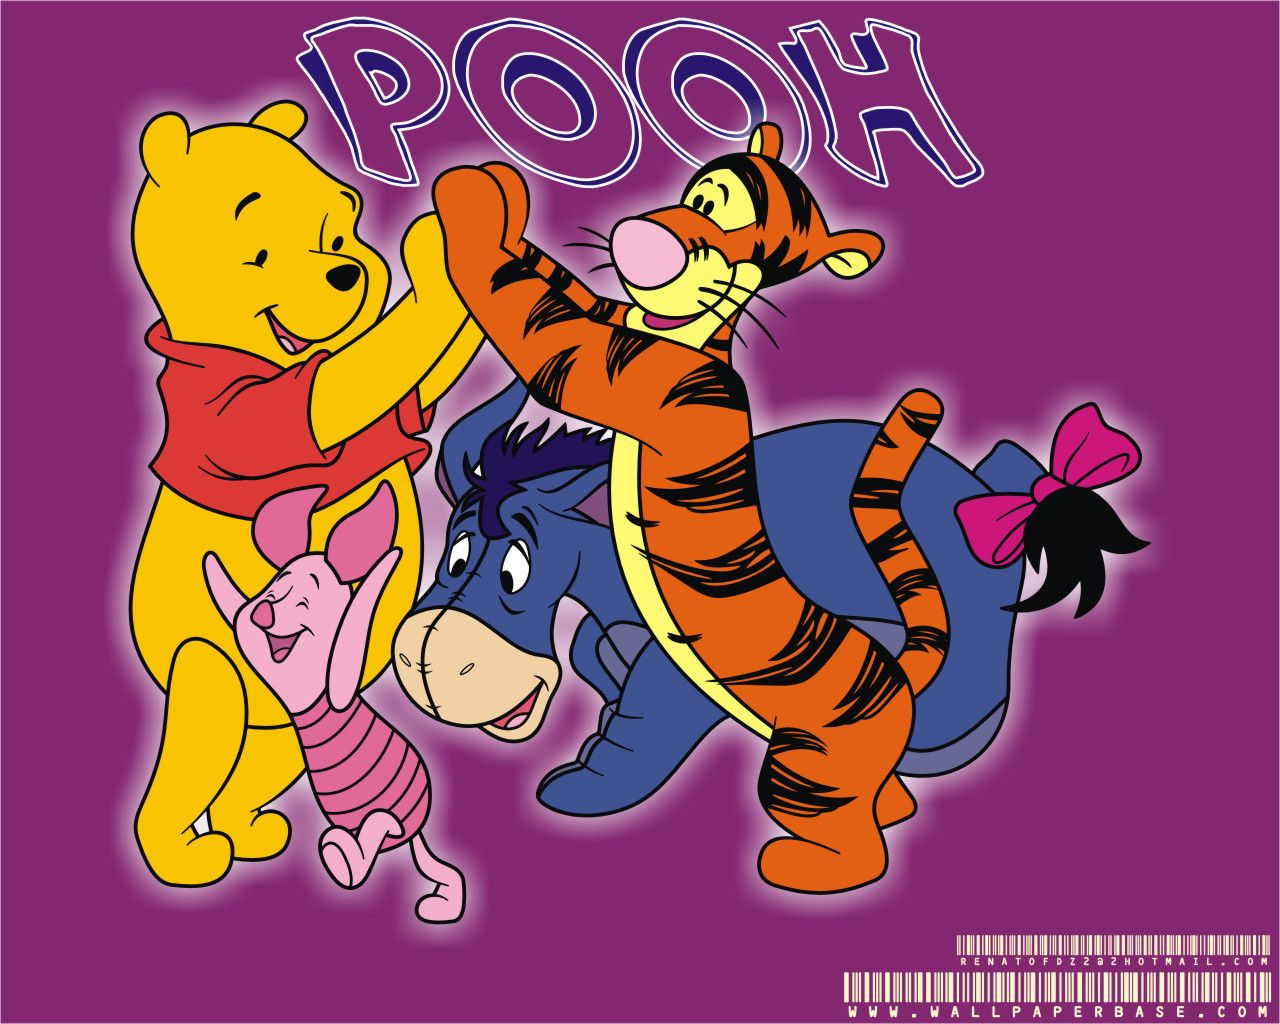 Winnie The Pooh Disney HD Wallpaper For IPad Air 2